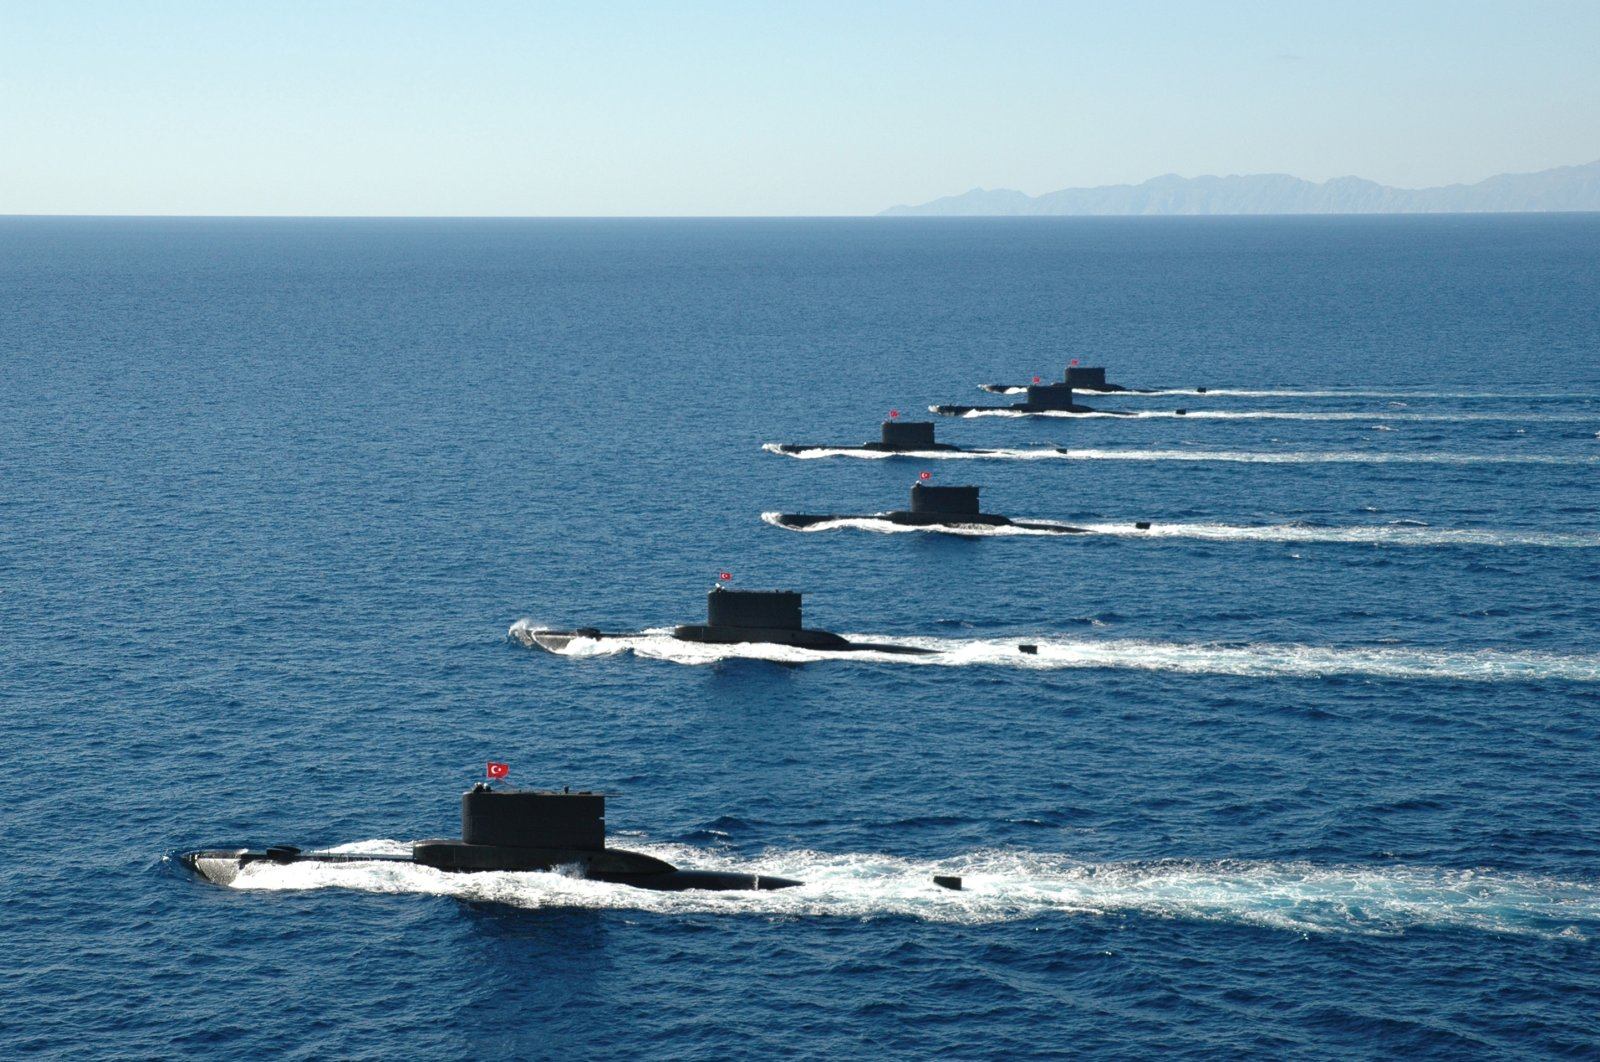 STM modernized the Turkish Naval Forces' submarines. (Courtesy of STM)